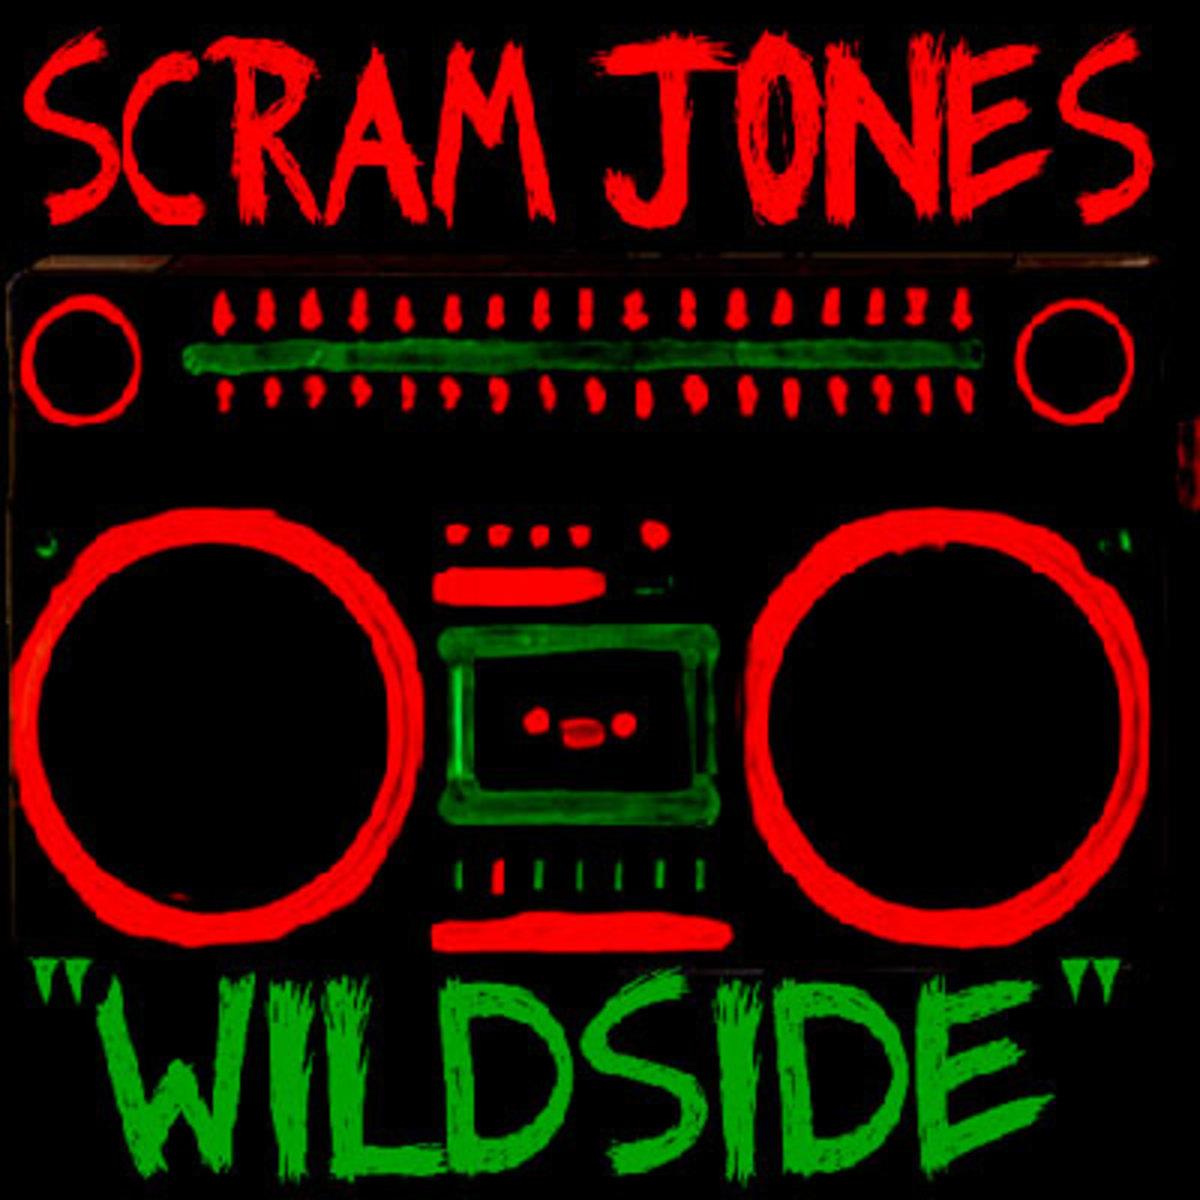 scramjones-wildside.jpg